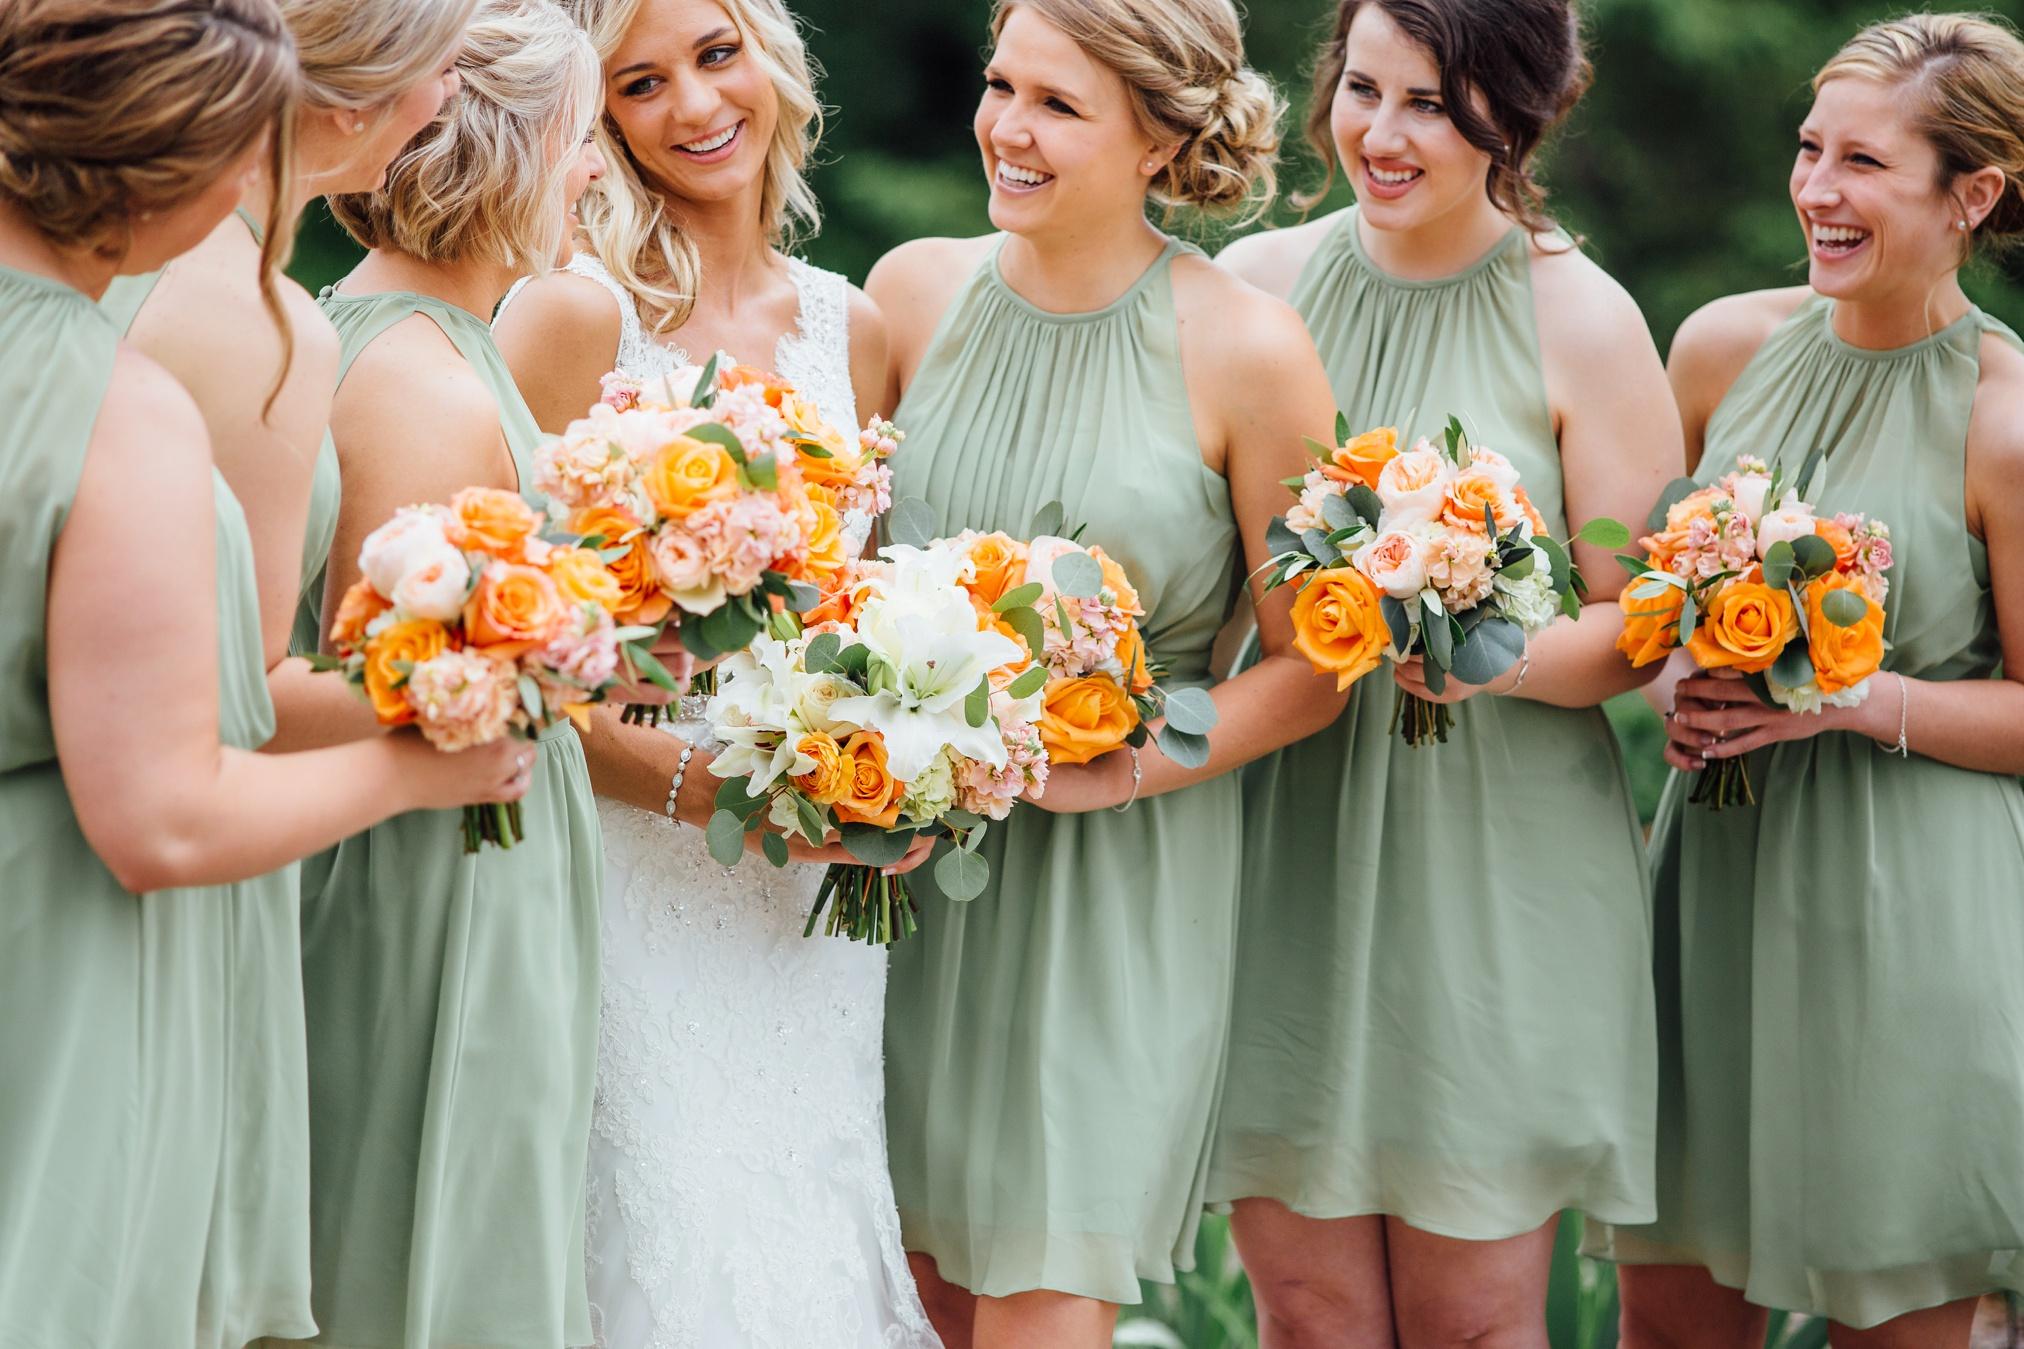 schmid_wedding-140.jpg